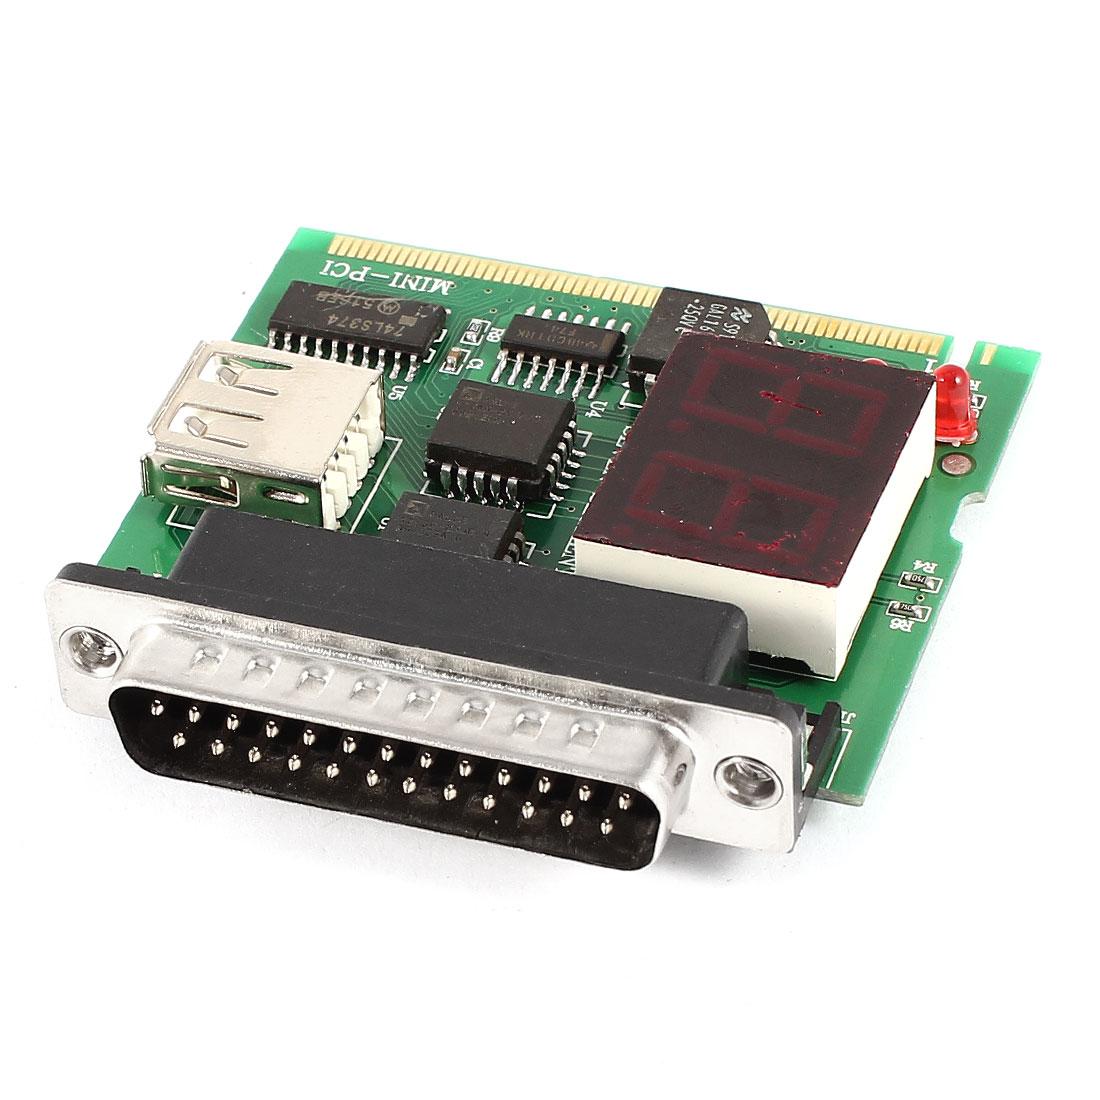 DB25 Parallel Port LPT Mini-PCI USB Port 2 Digit Motherboard Test Analyzer Diagnostic Card for PC Laptop Notebook